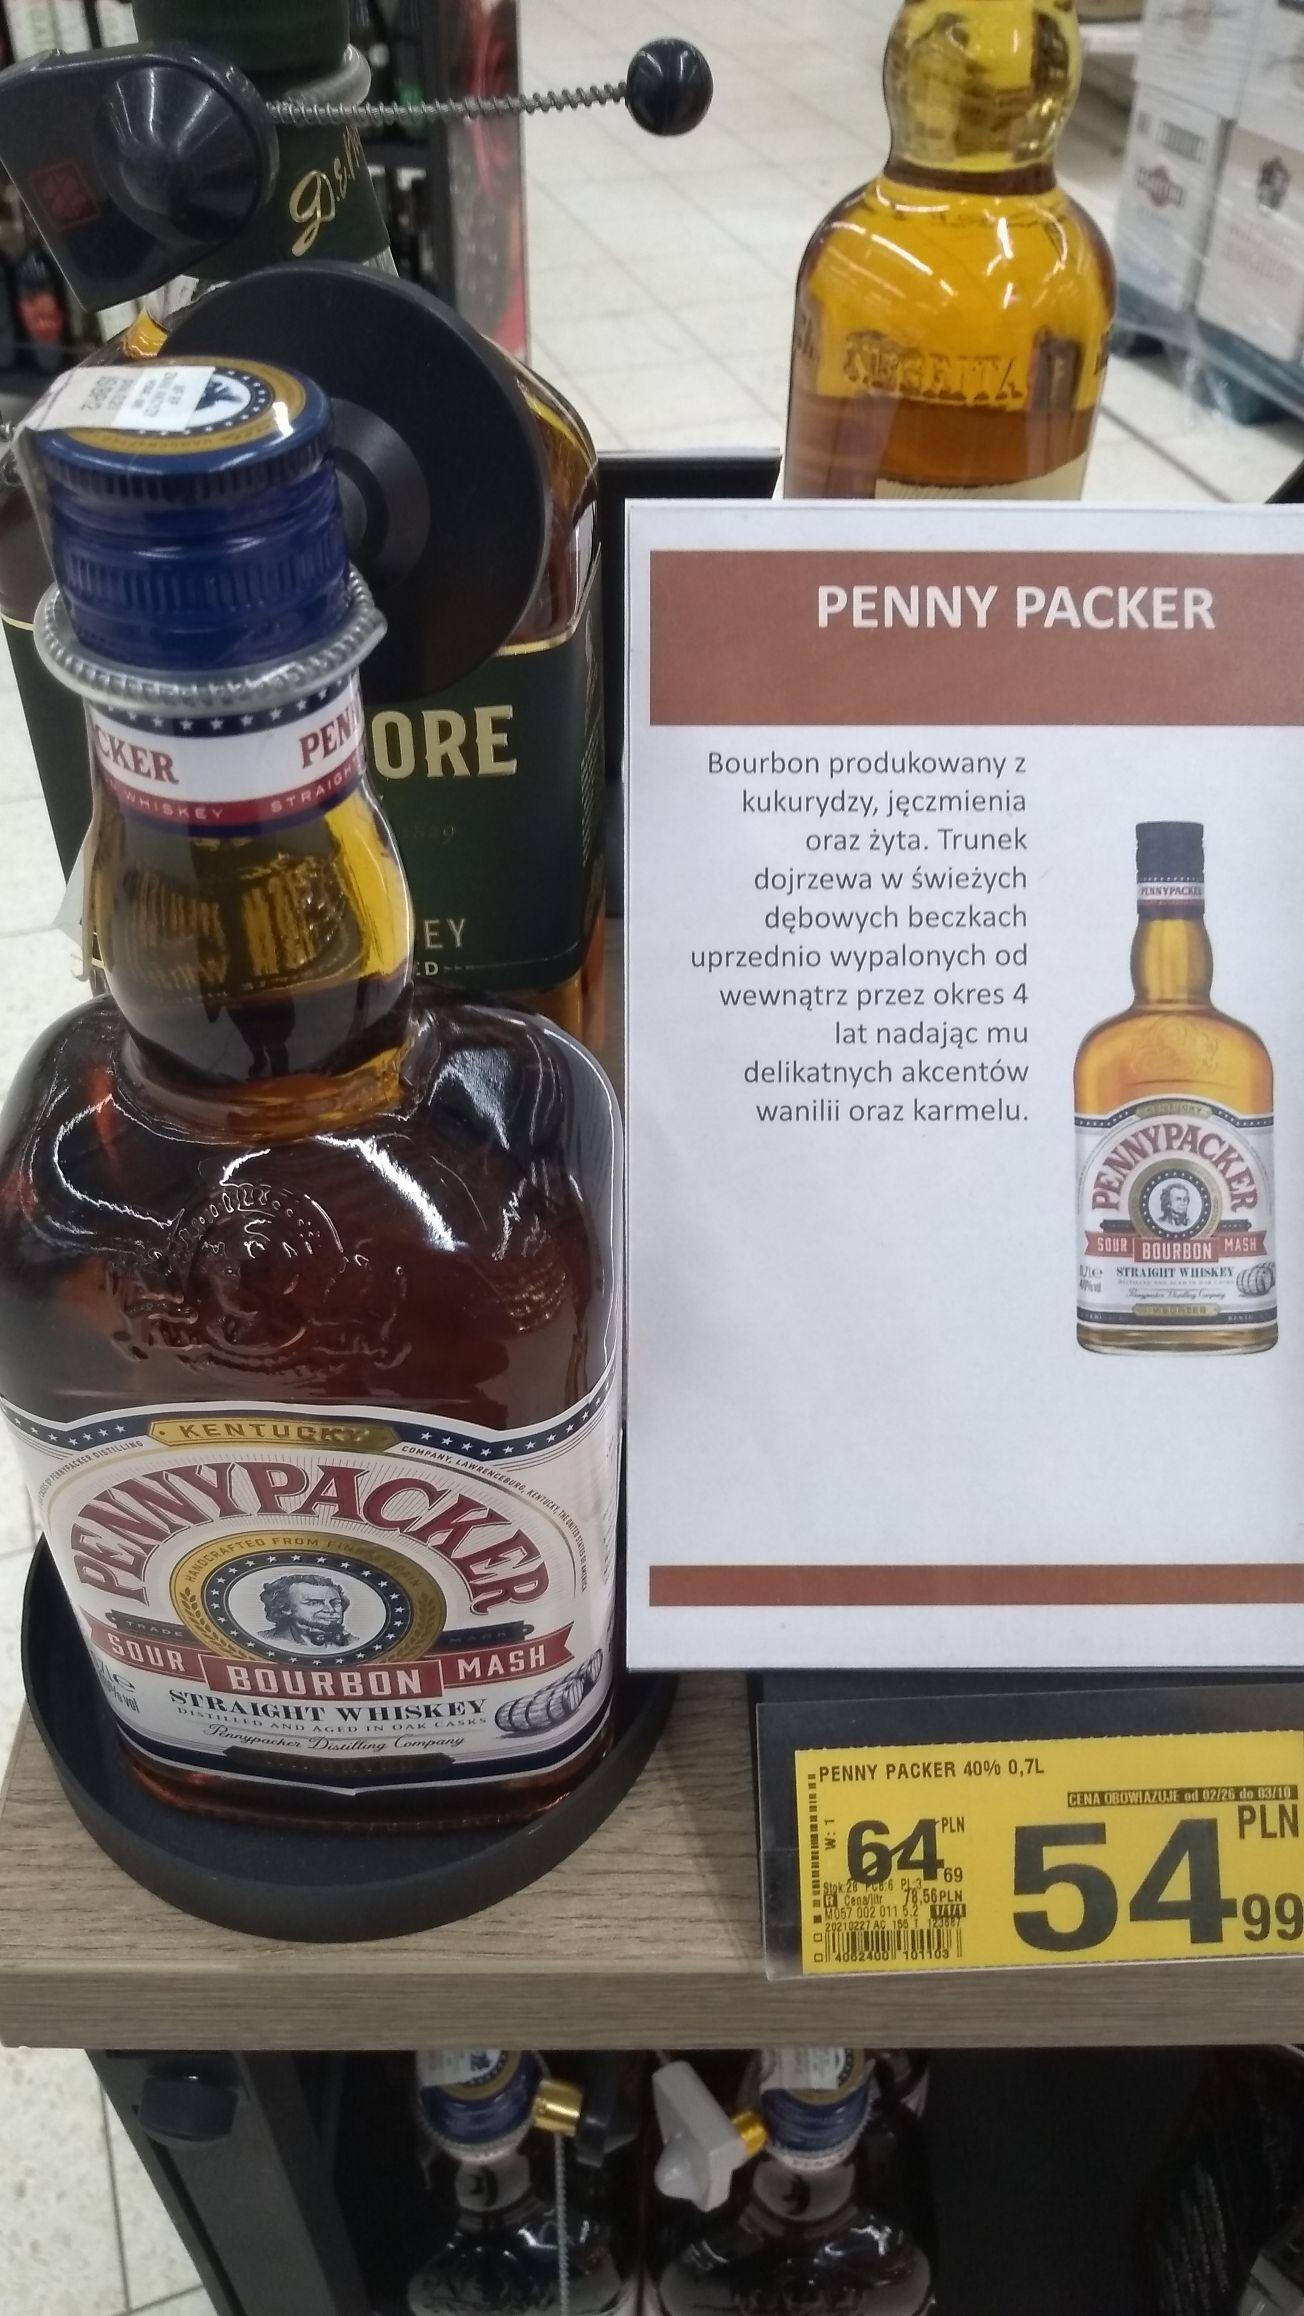 Bourbon Whiskey PennyPacker 0.7l. Auchan